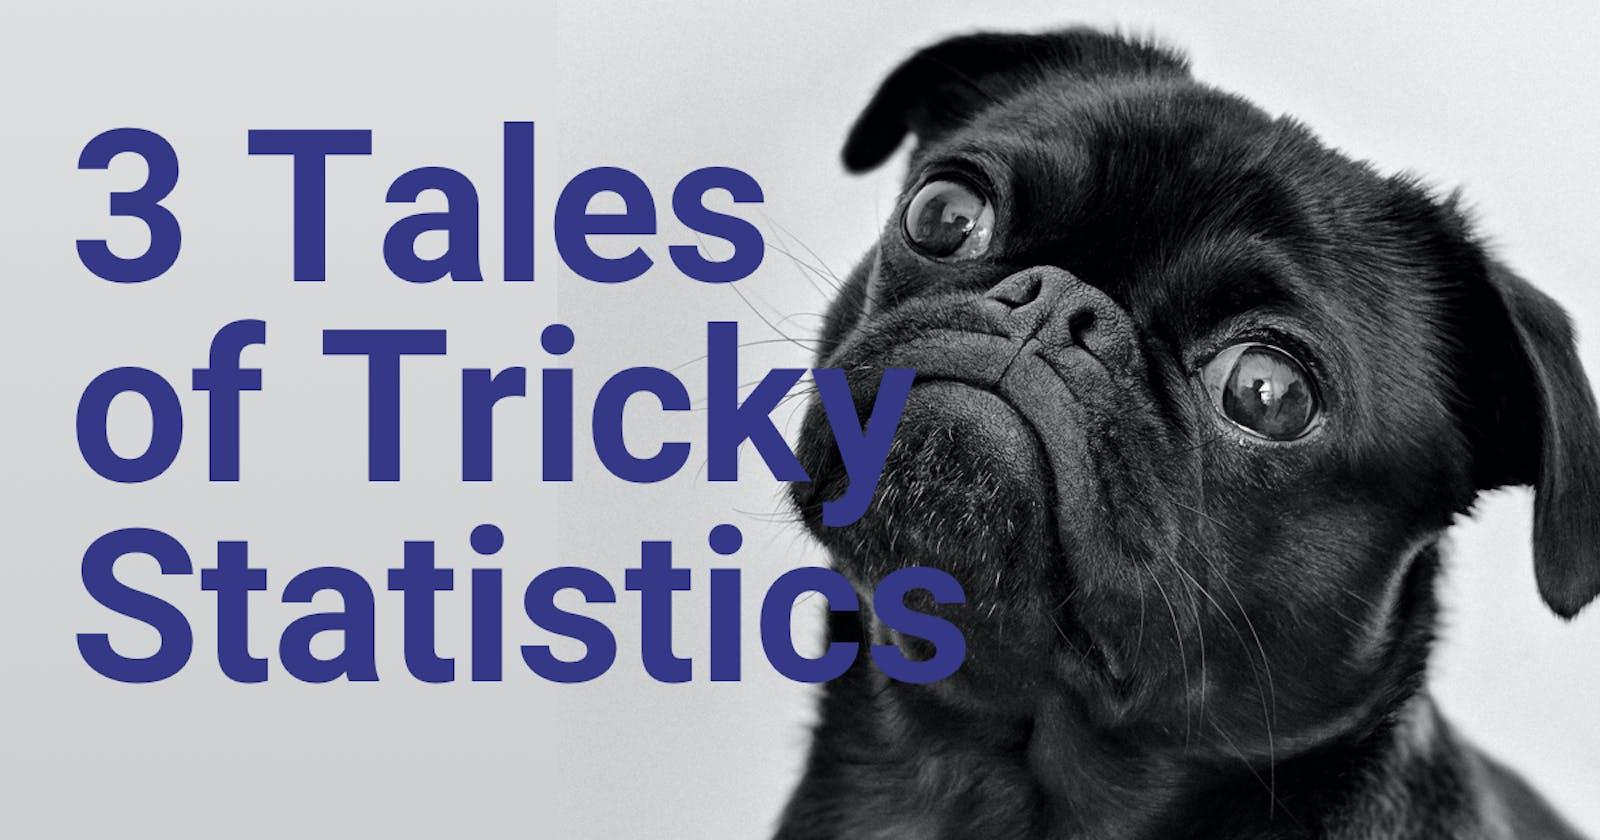 3 Tales of Tricky Statistics